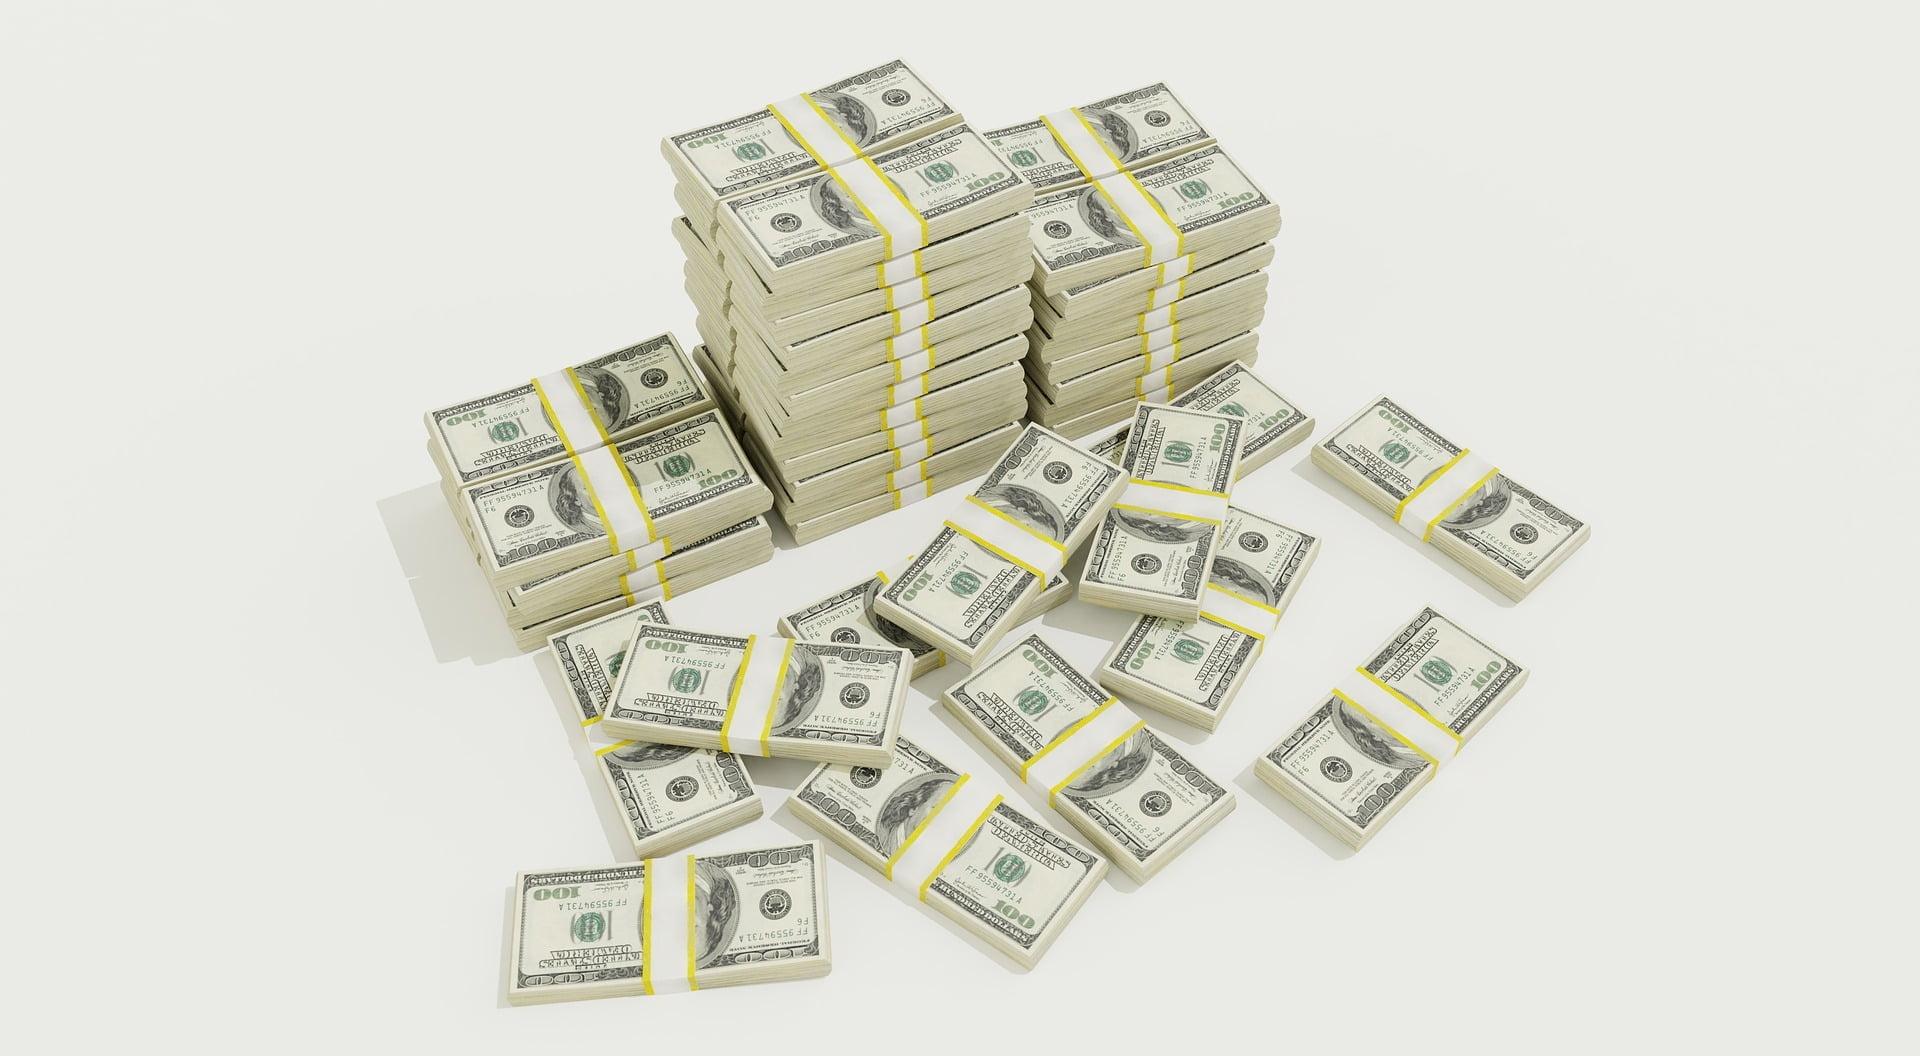 Large loan amounts